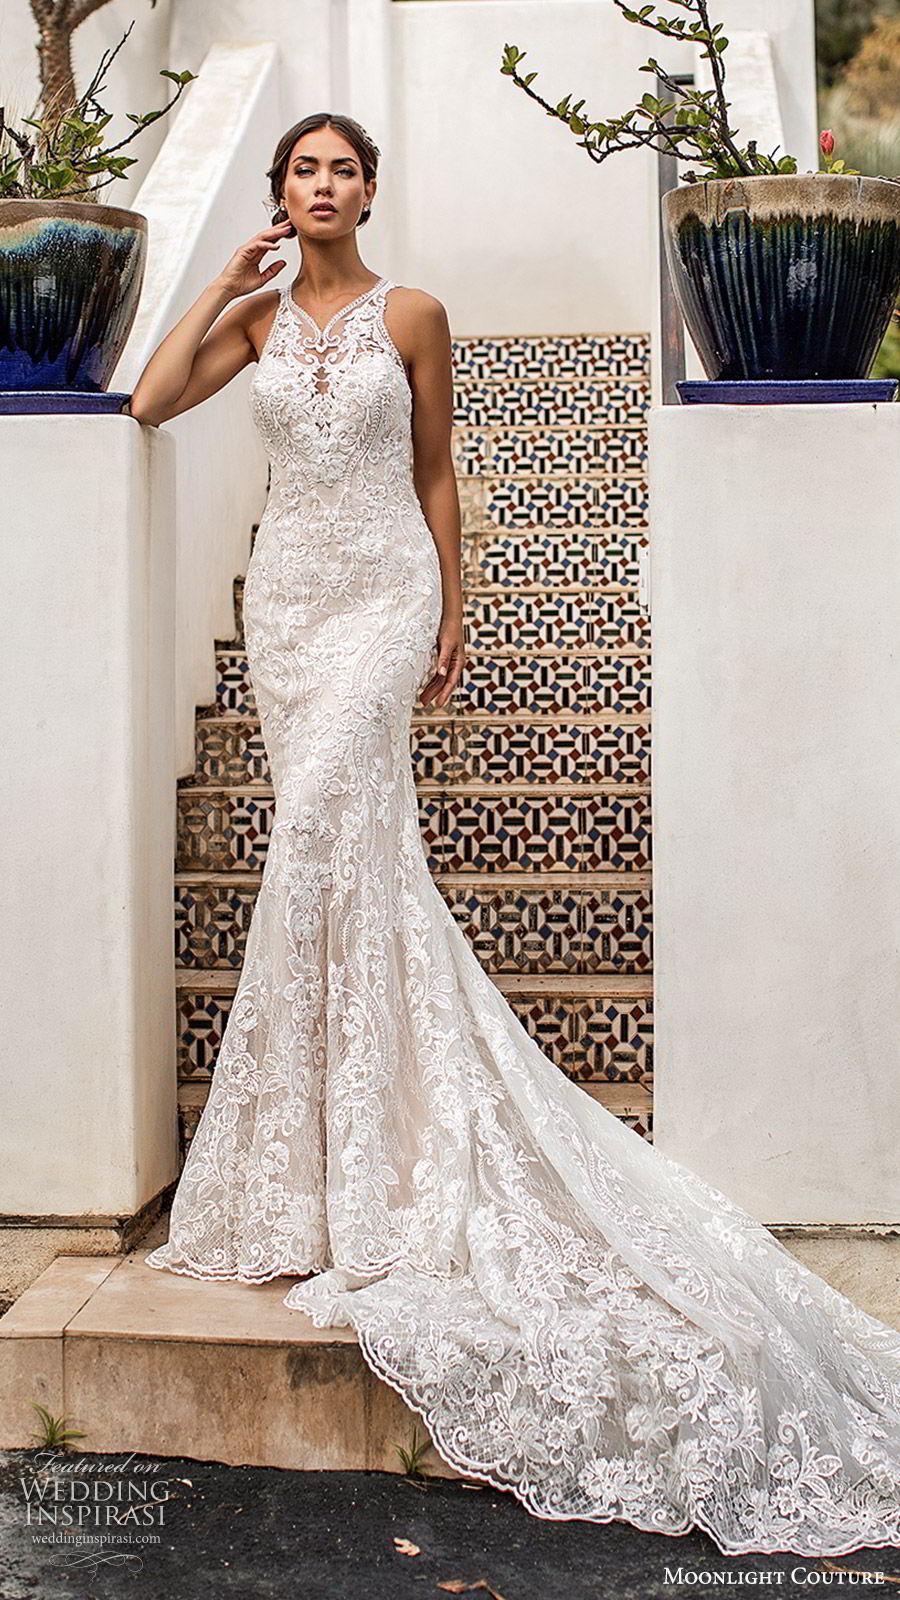 moonlight couture fall 2019 bridal sleeveless illusion hatler neckline fully embellished lace sheath mermaid wedding dress (6) glitzy glam elegant illusion back chapel train mv